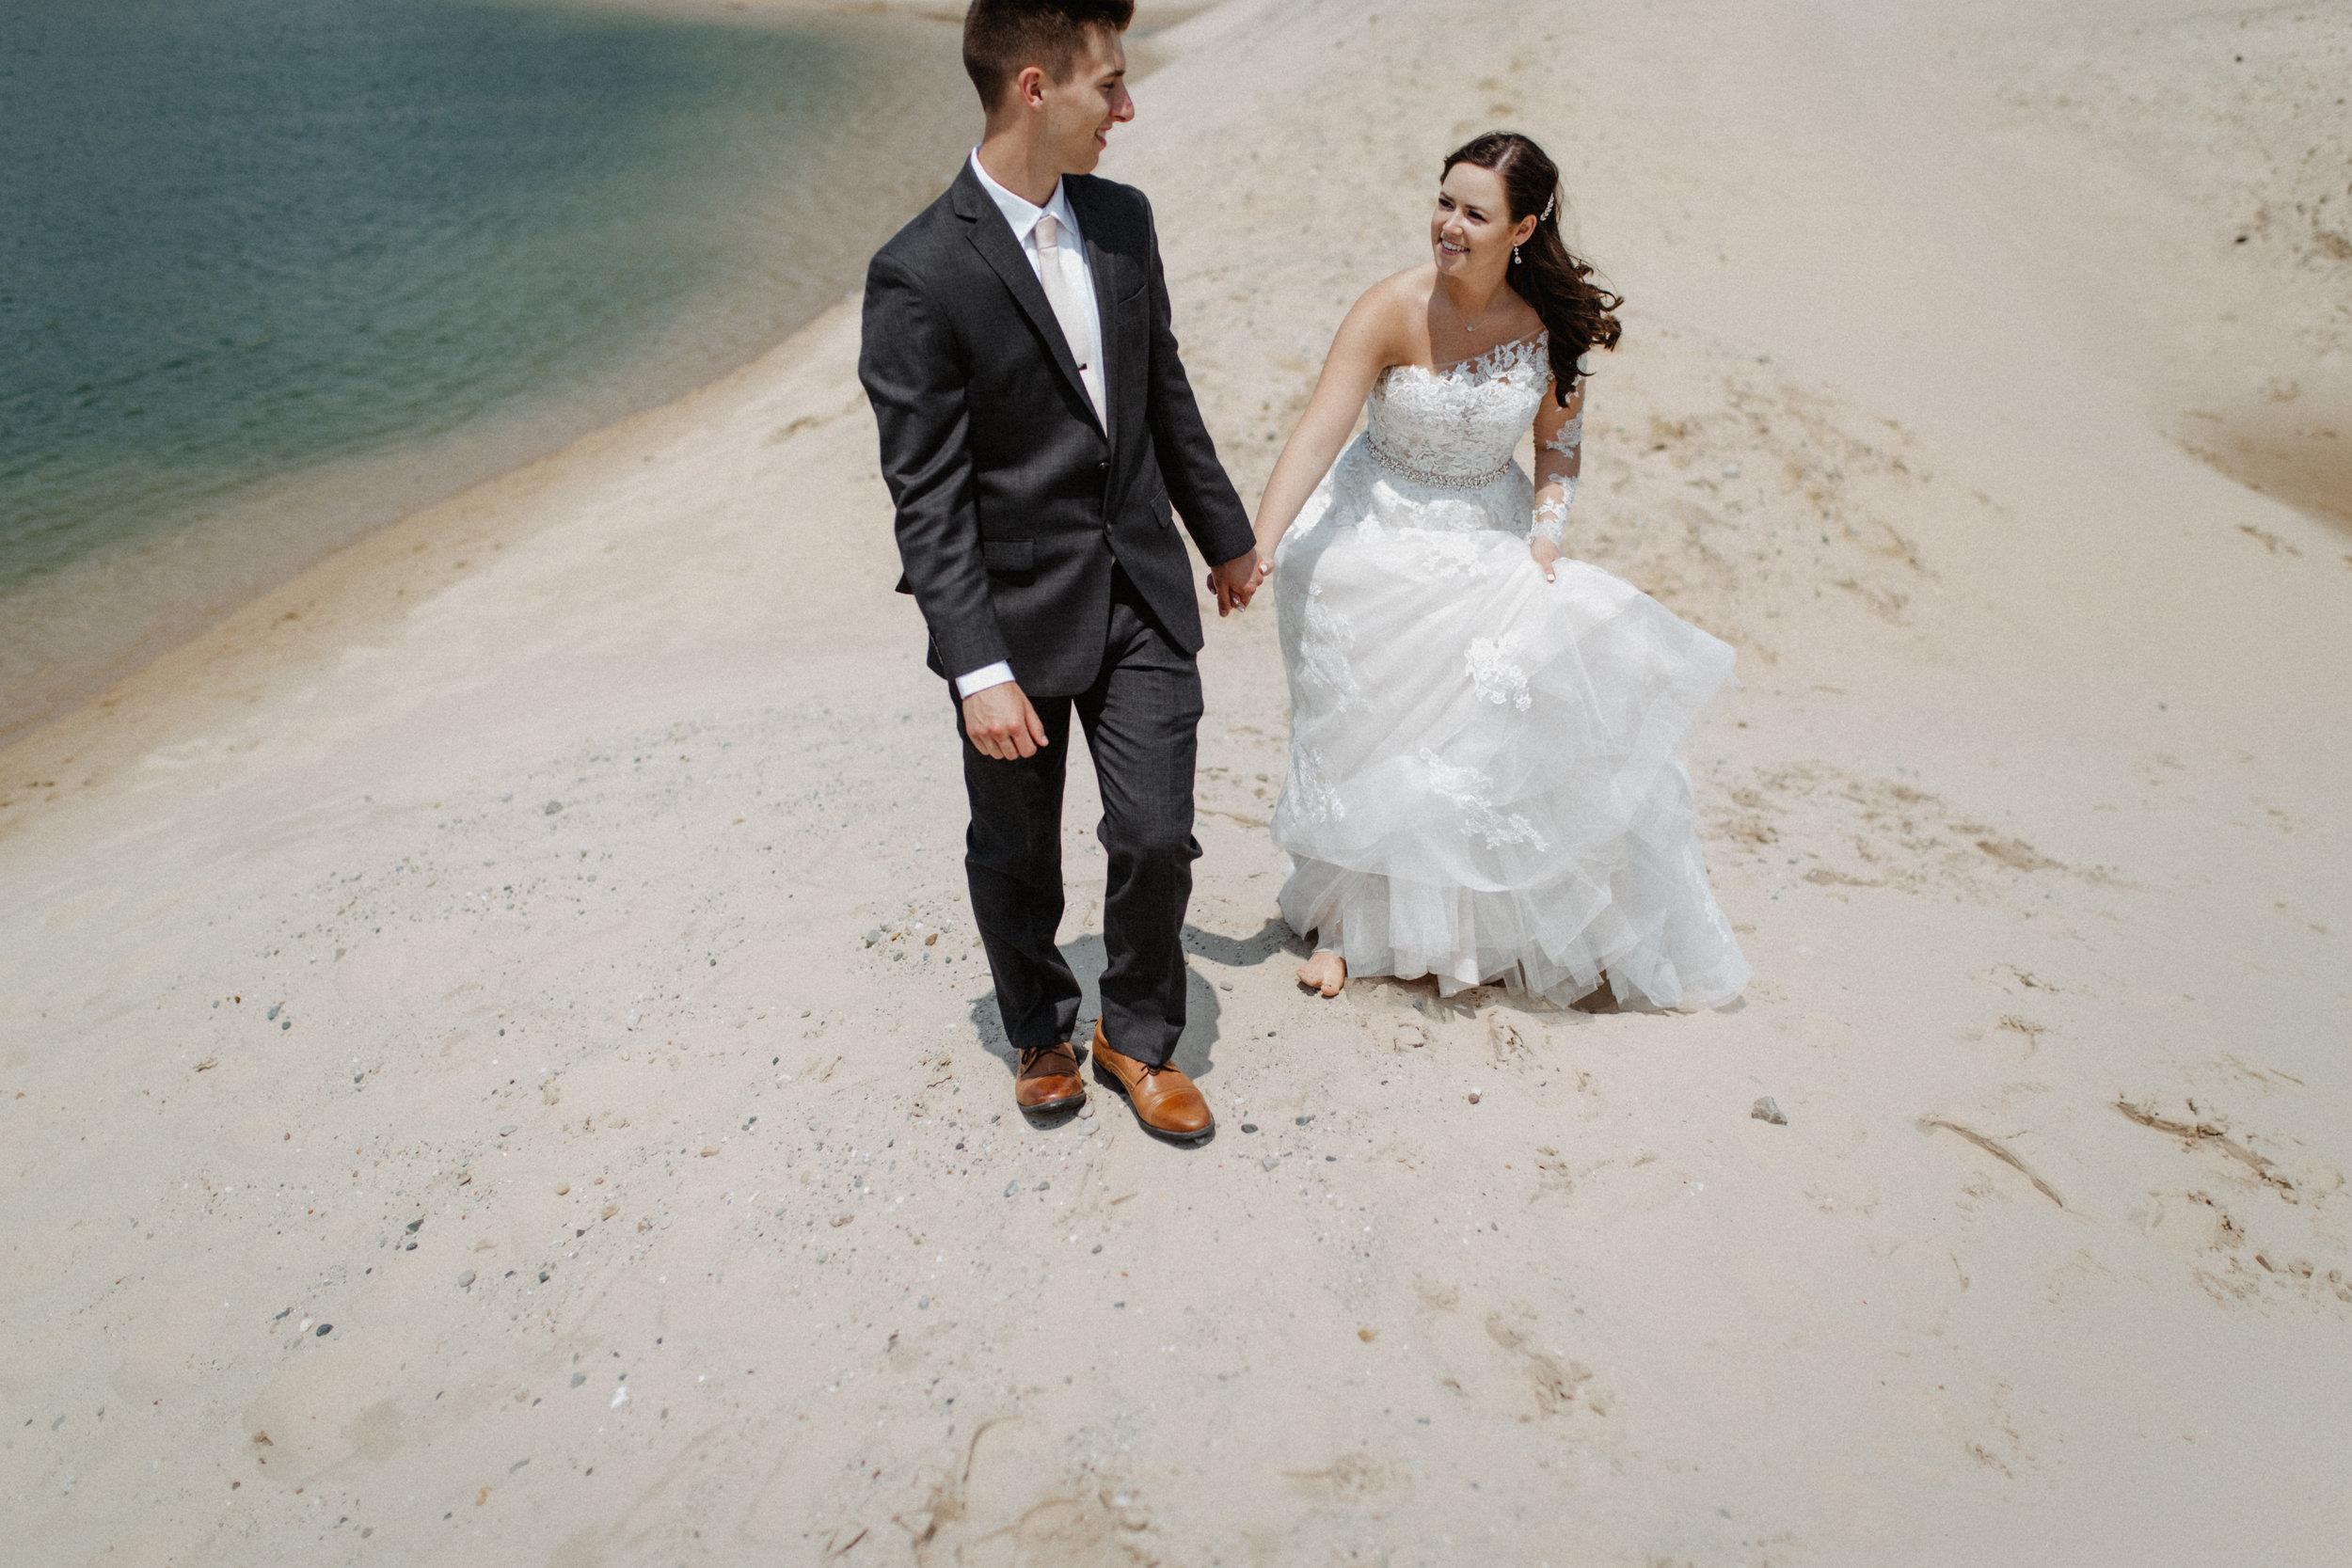 GRAYCENTOMHAMILTON-GRAND-RAPIDS-WEDDING-PHOTOGRAPHY-31.jpg